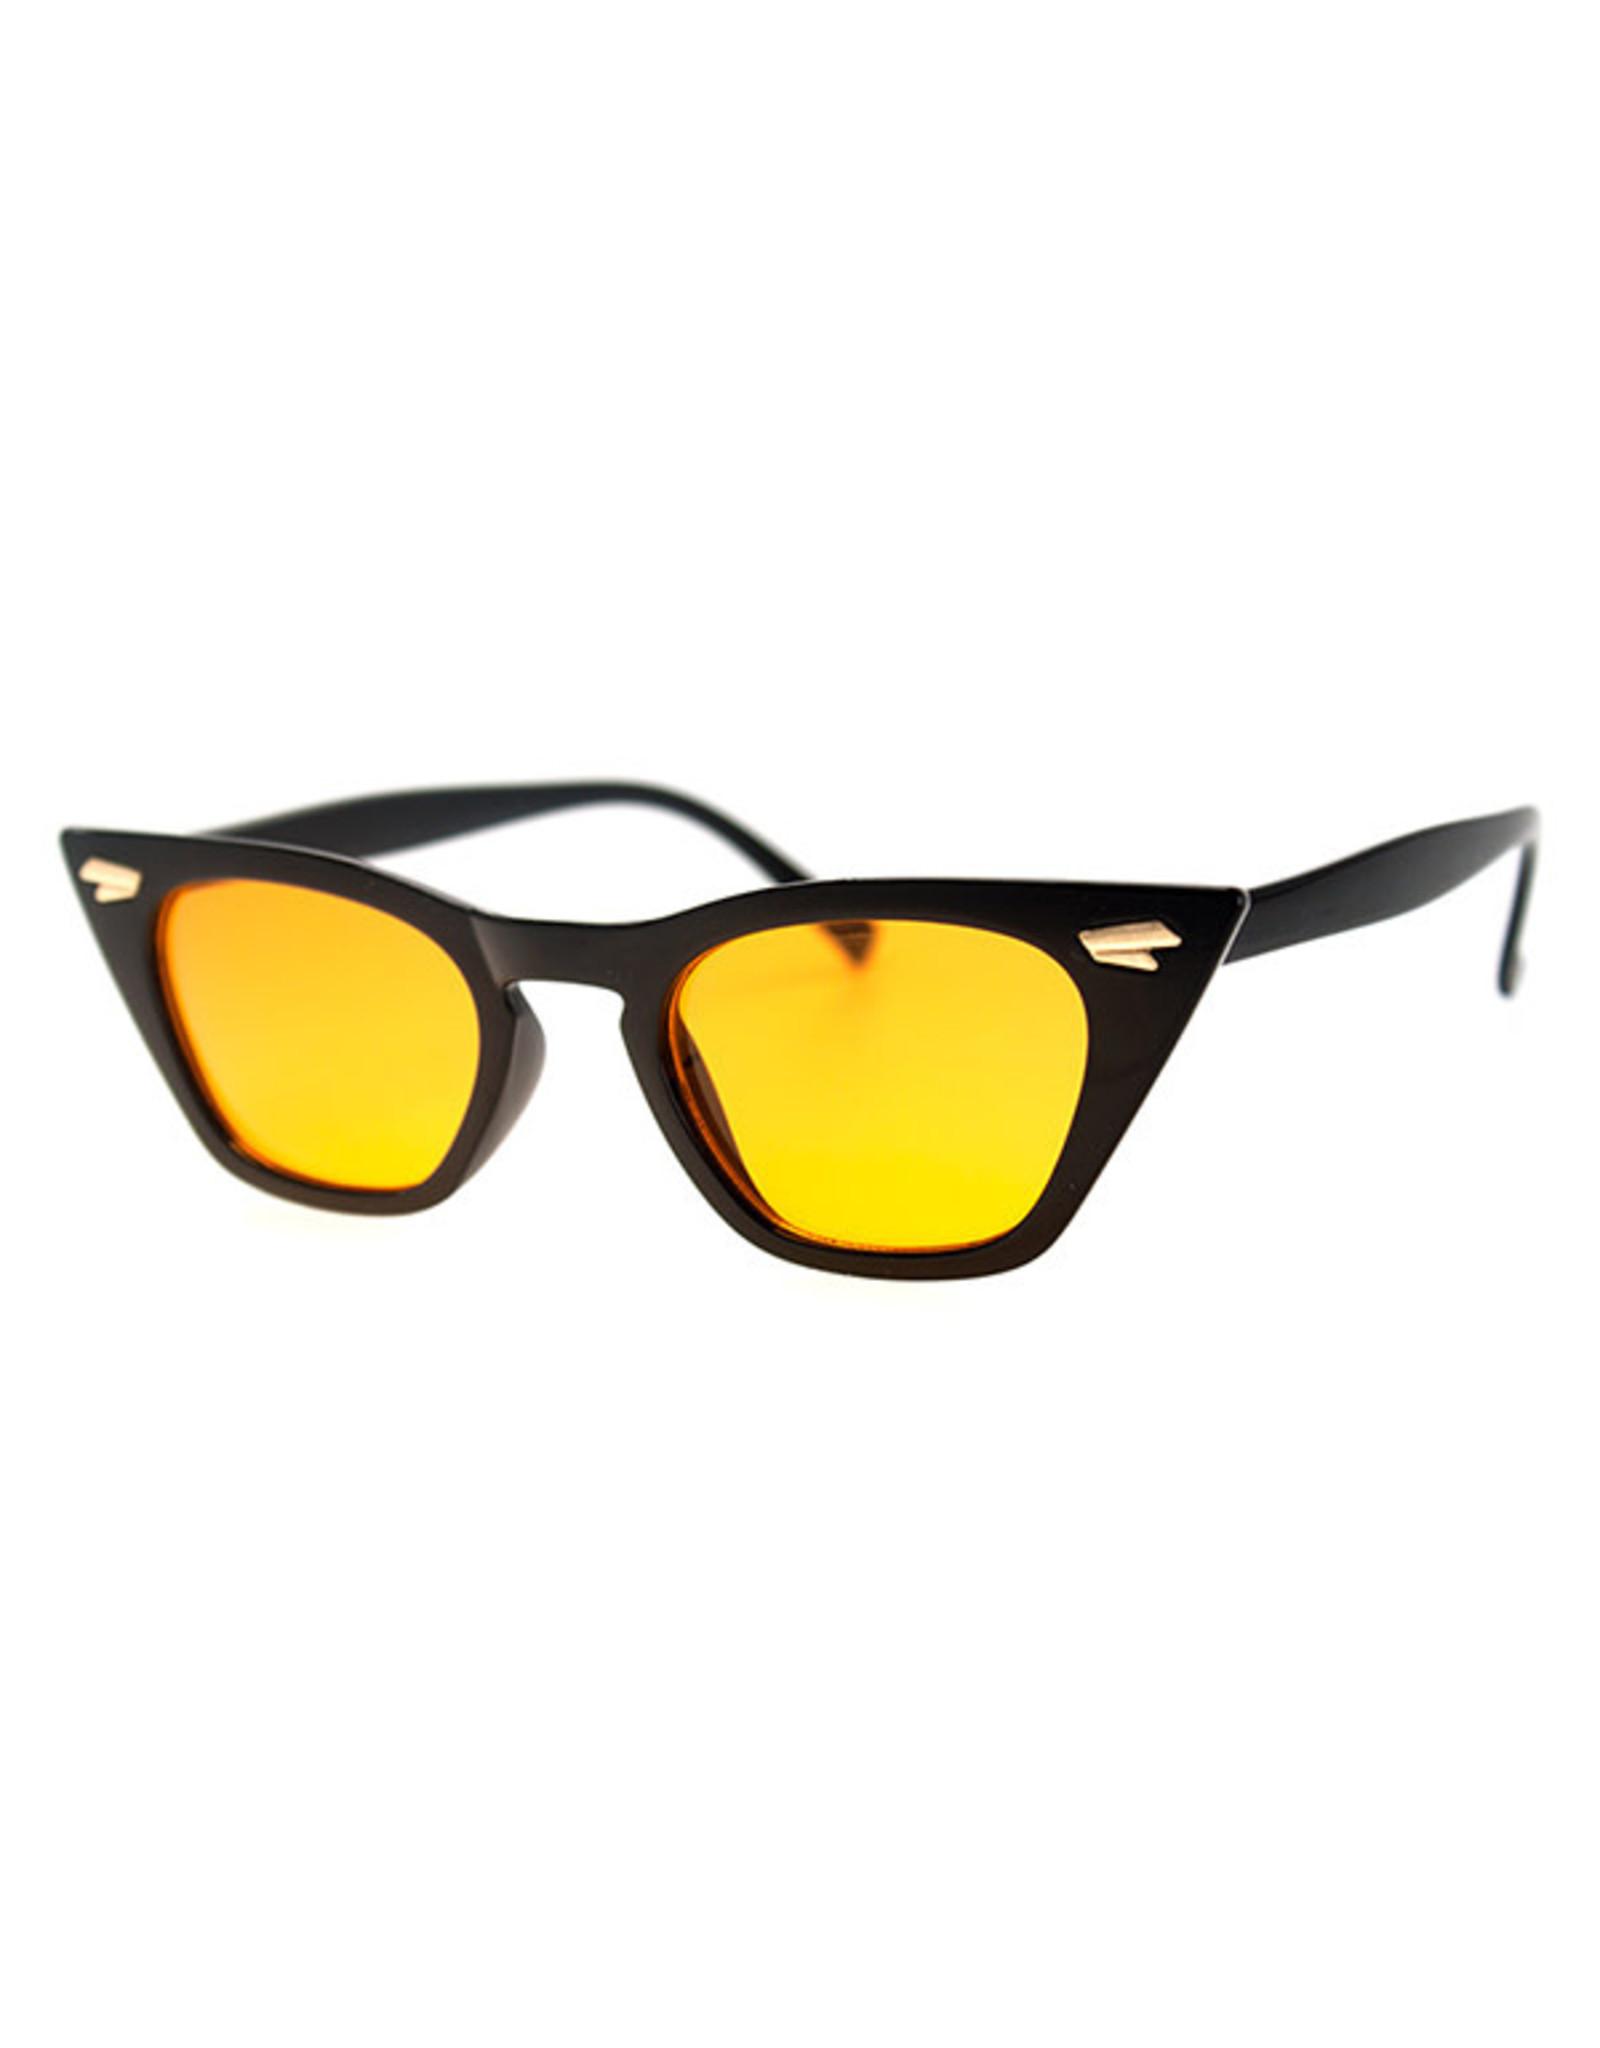 AJM - Skinny Cat-eye Frame Sunglasses Black